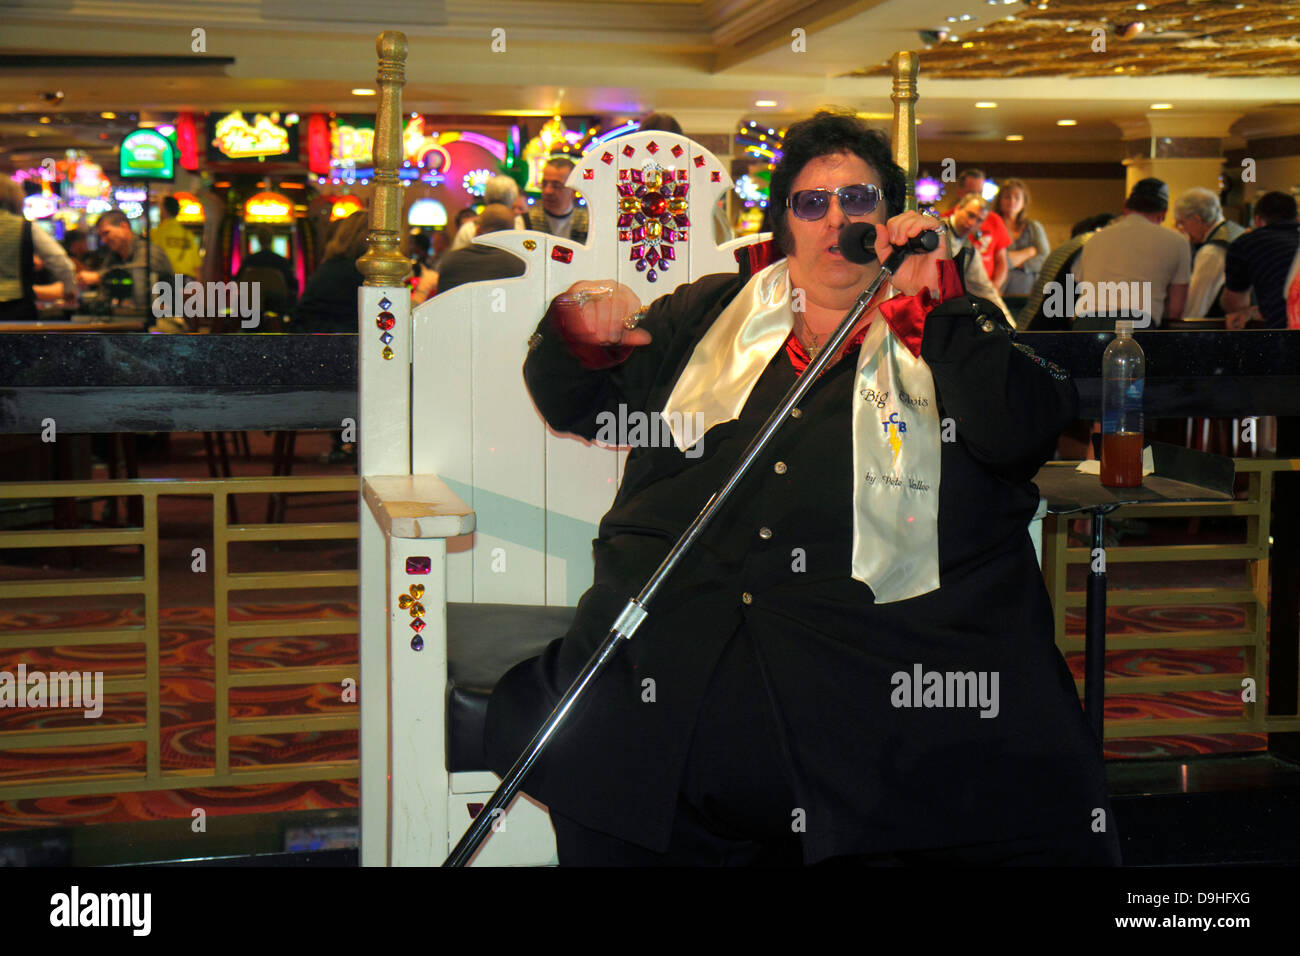 Big nevada casino black casino jack poker room